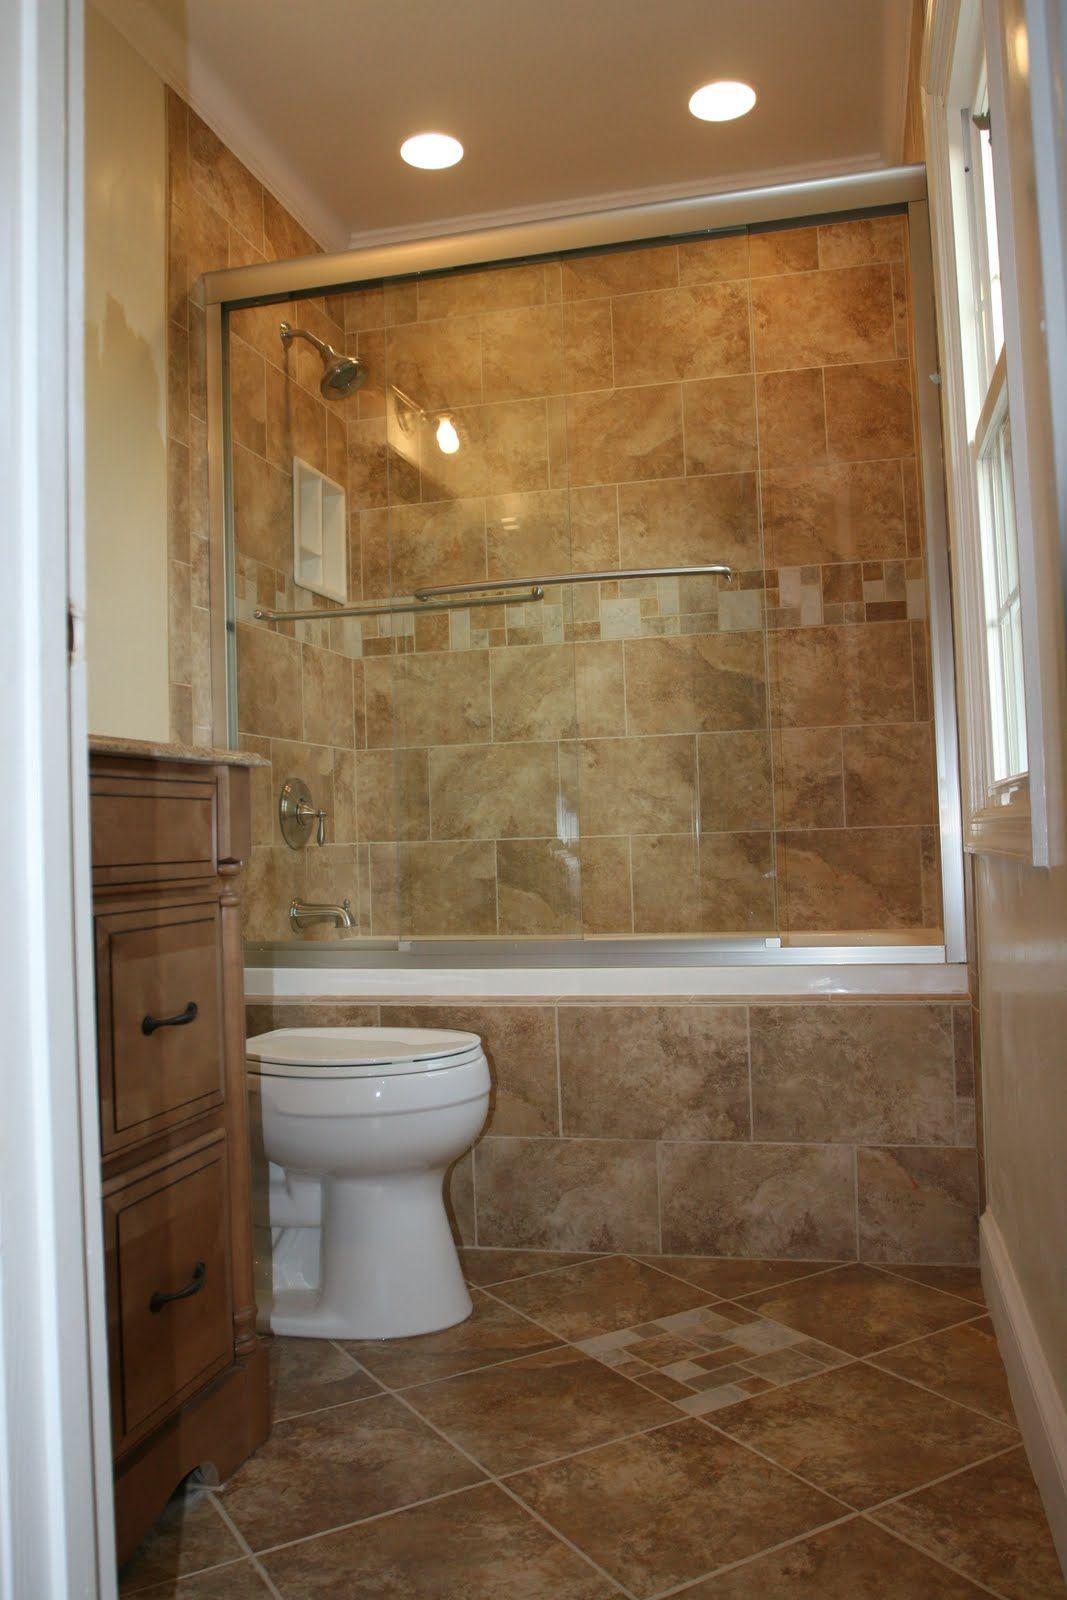 Bathroom Design Small Bathroom Tiles Budget Bathroom Remodel